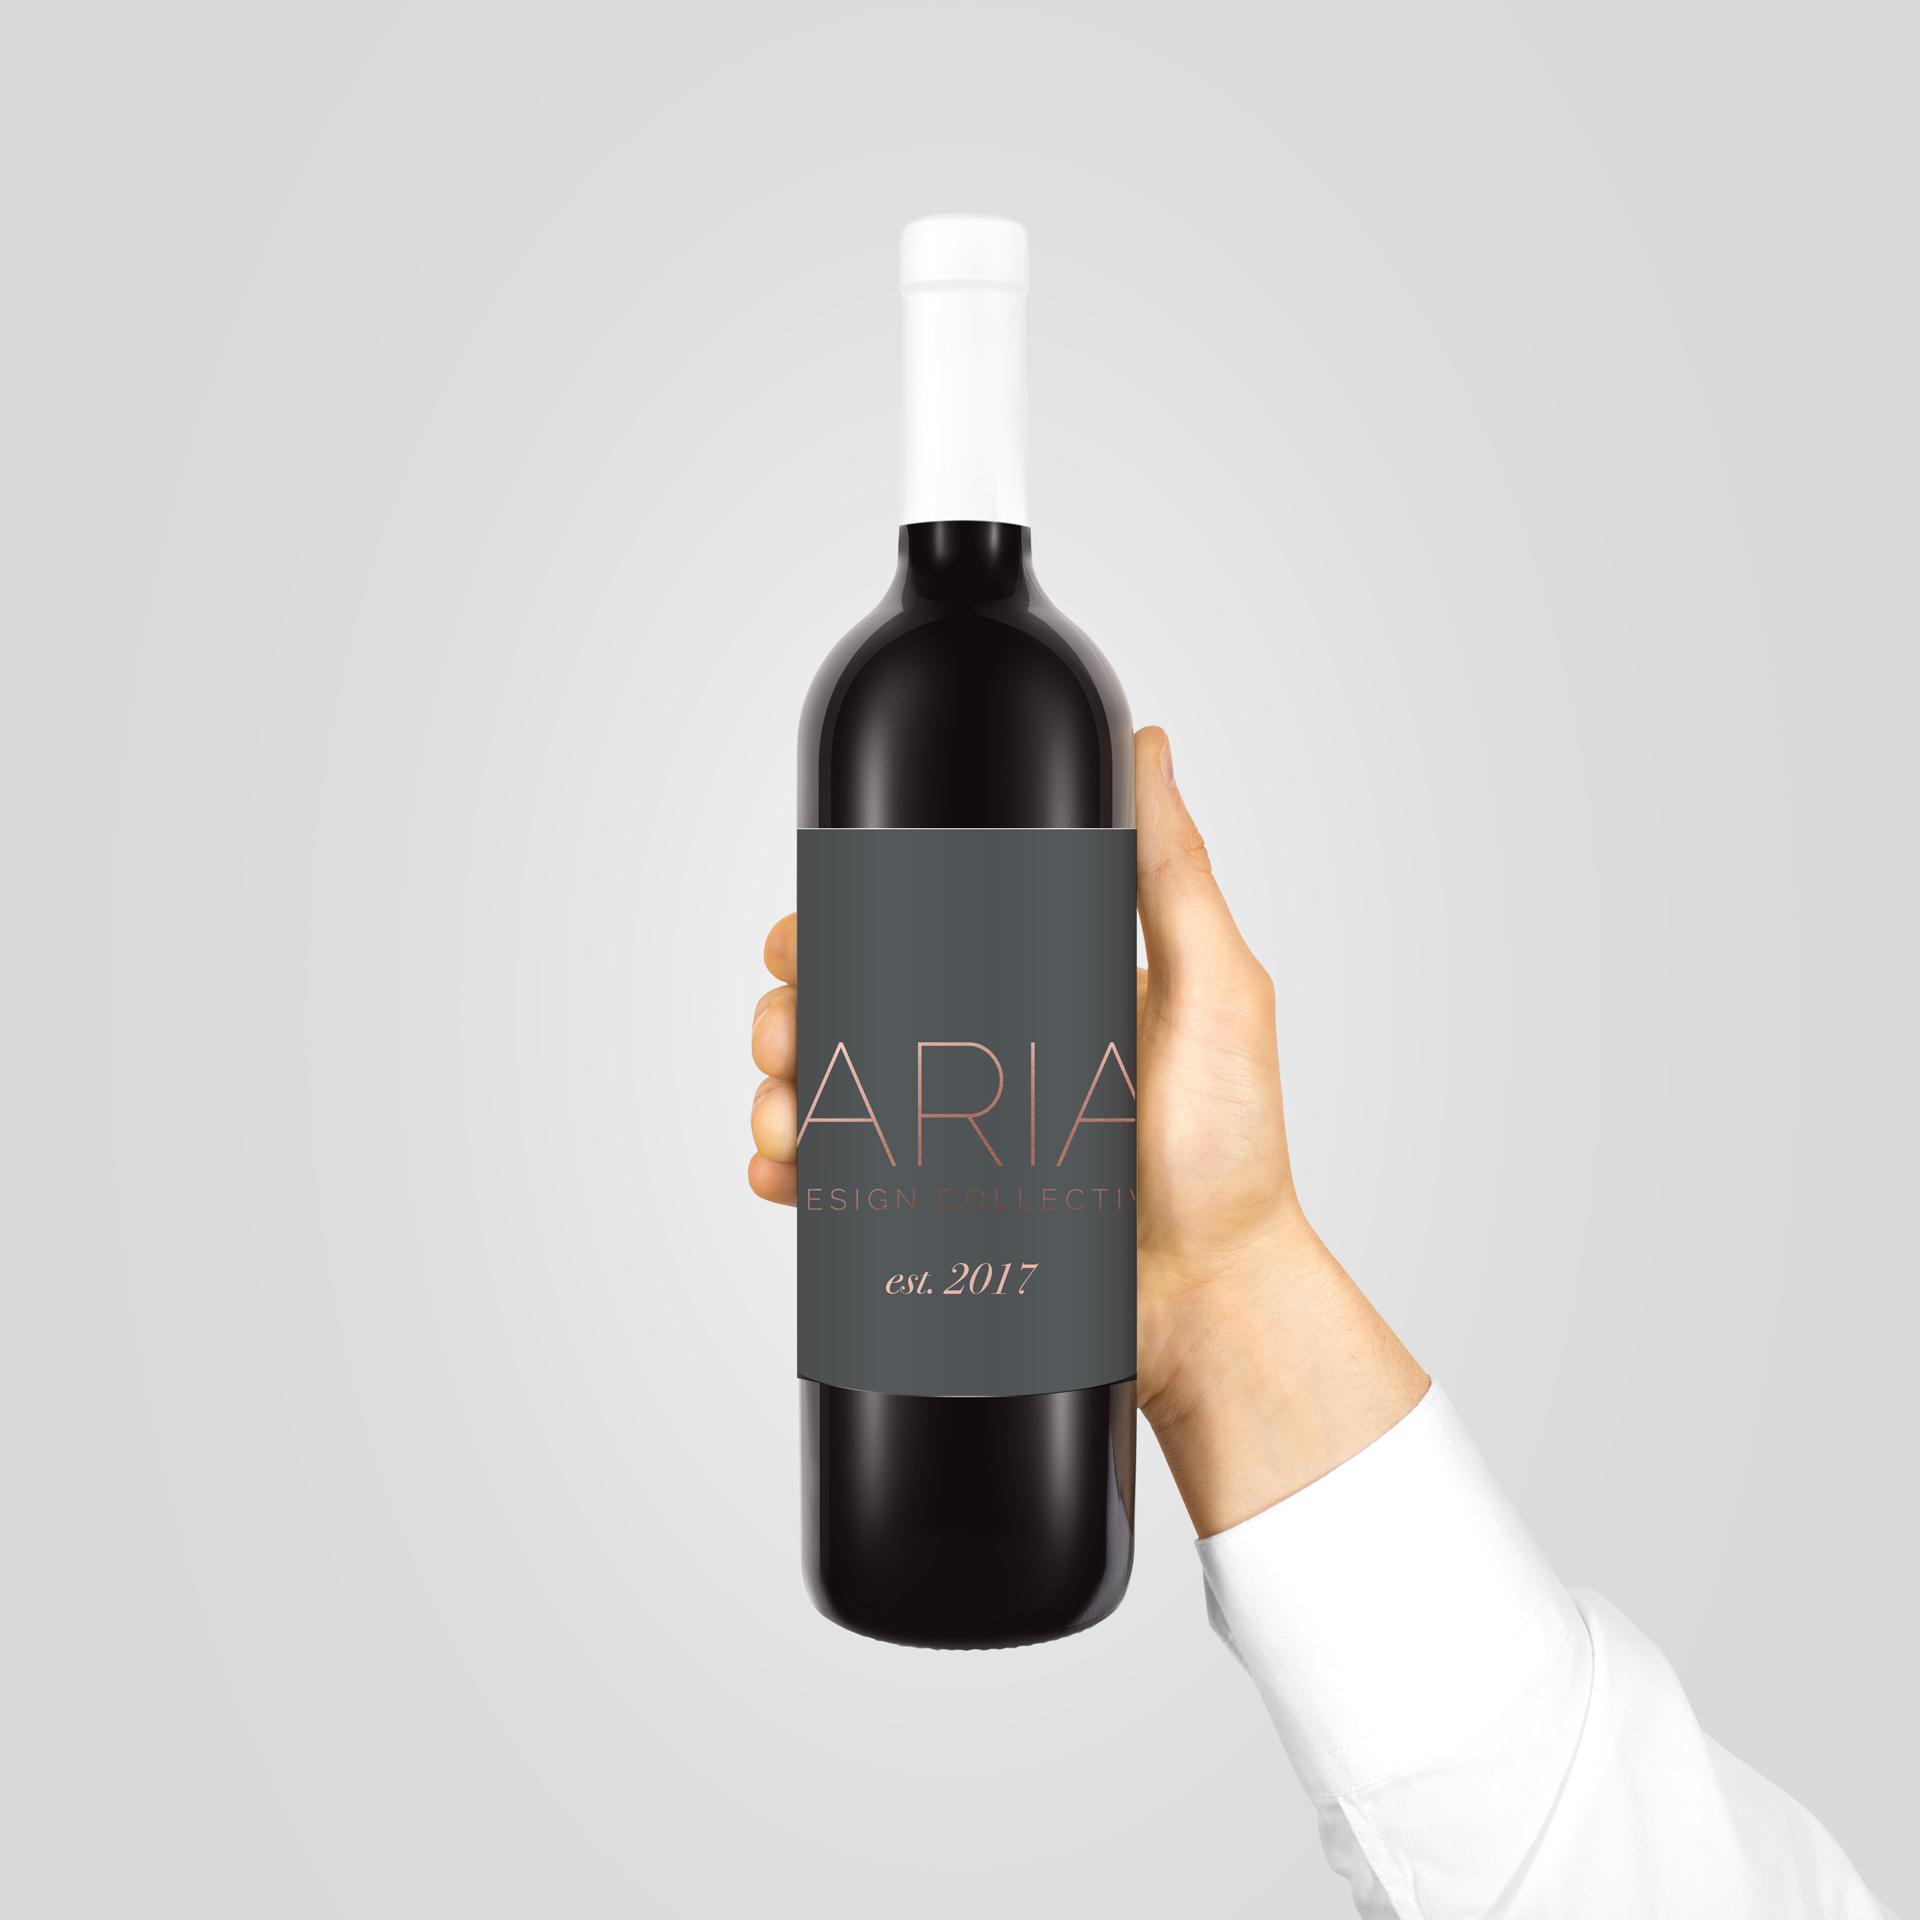 ARIA-wine-label.jpg